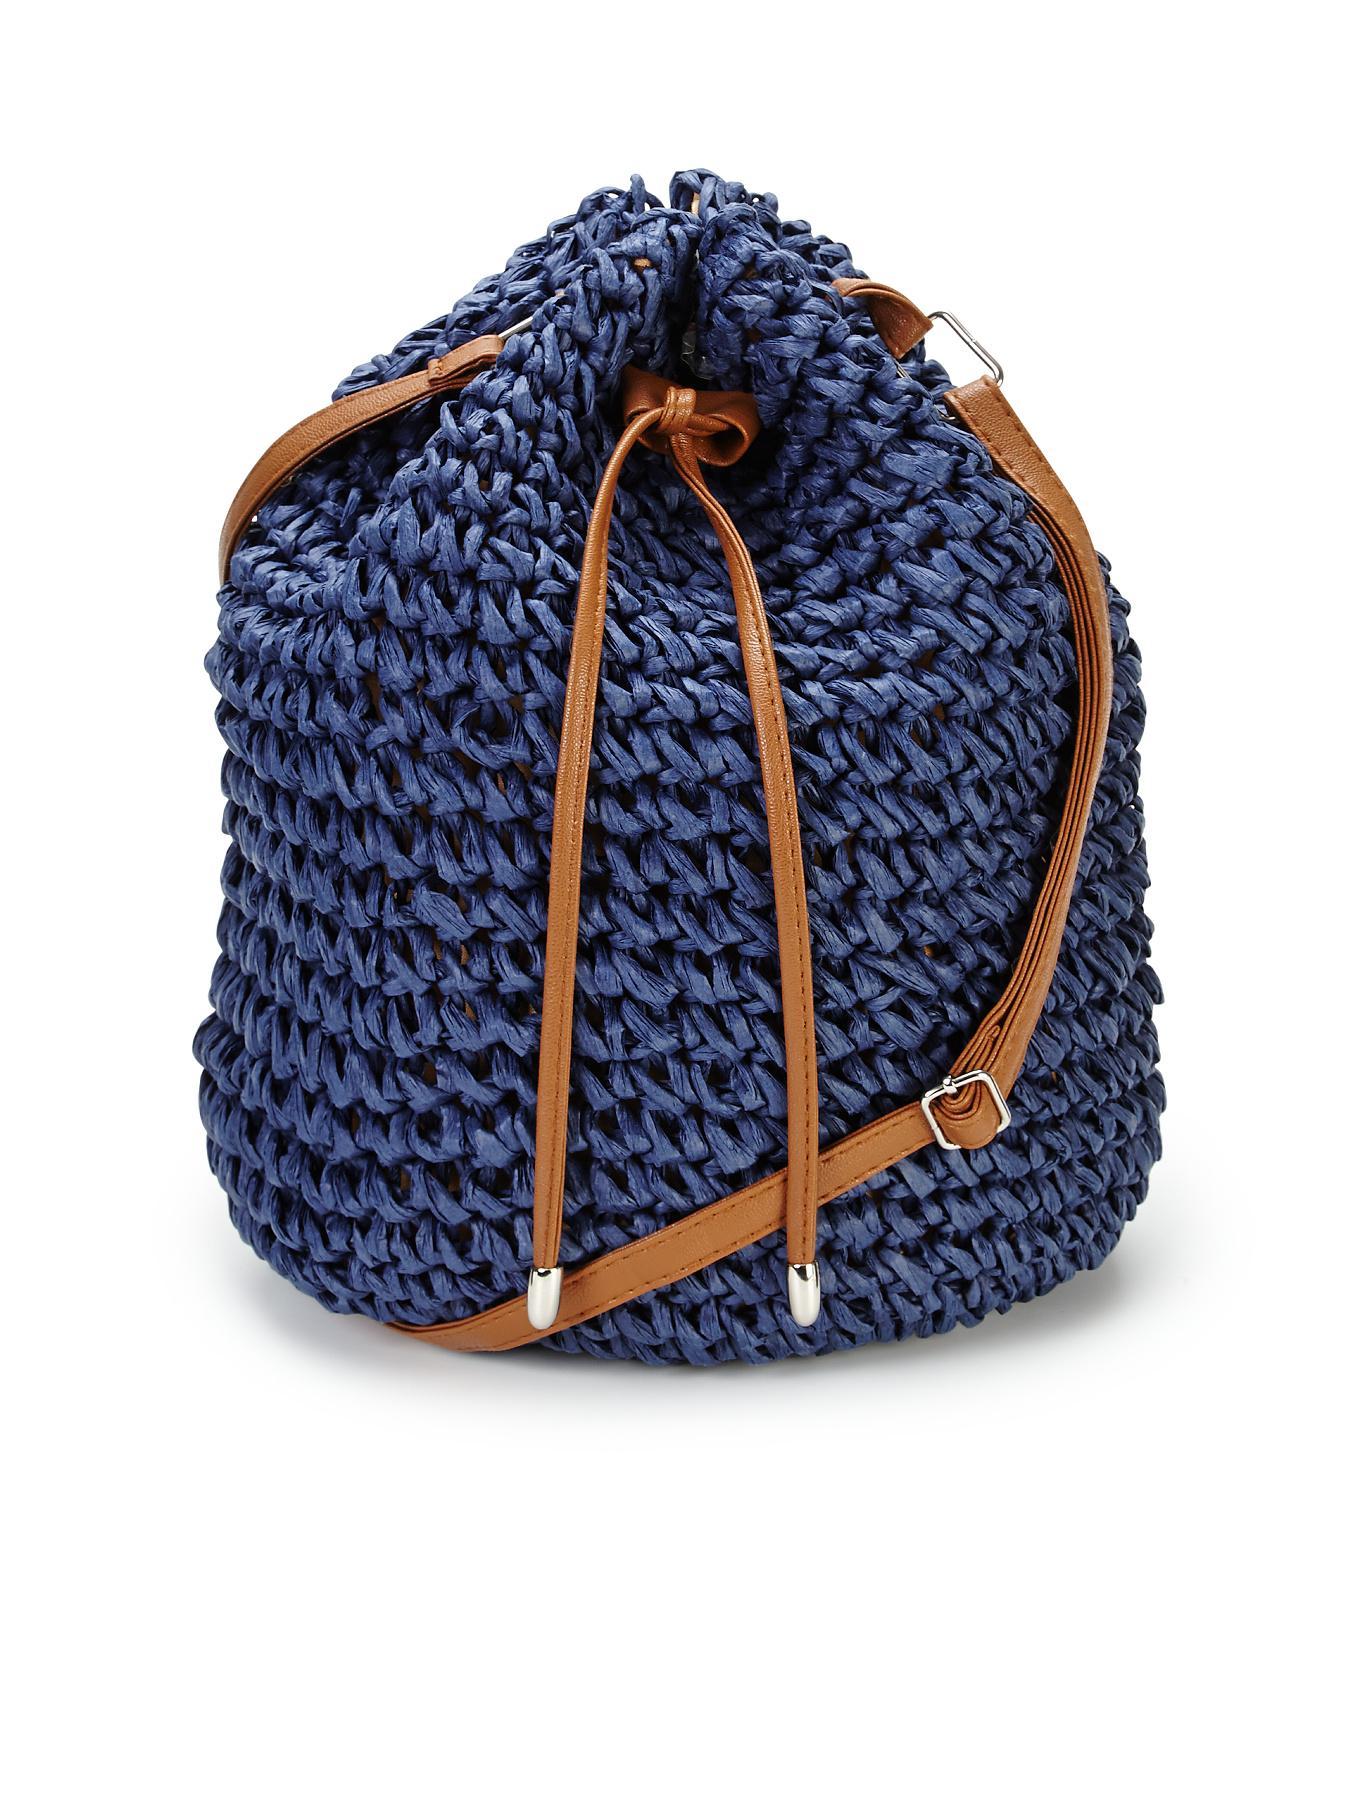 Straw Duffle Bag